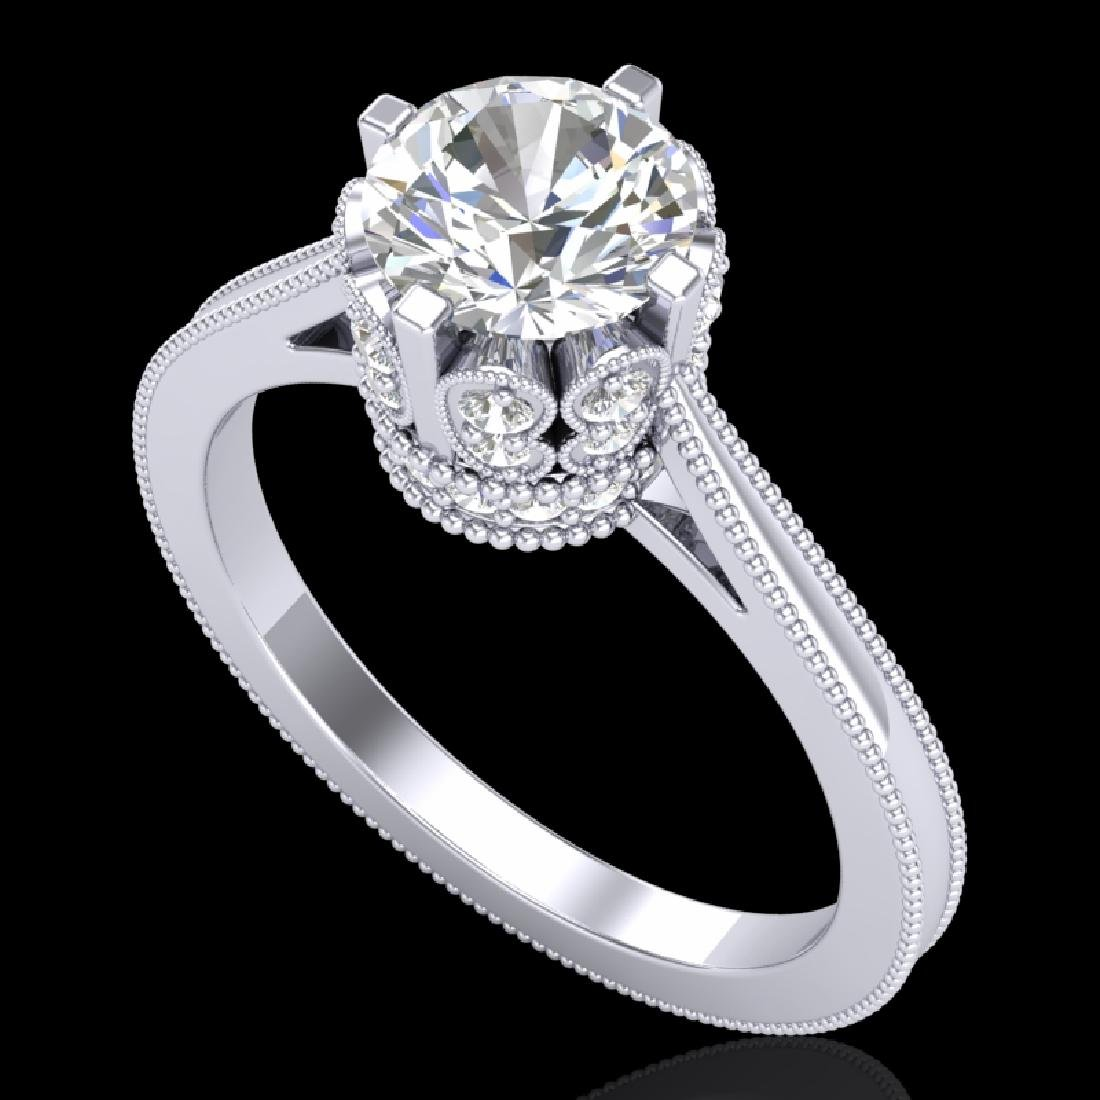 1.5 CTW VS/SI Diamond Art Deco Ring 18K White Gold